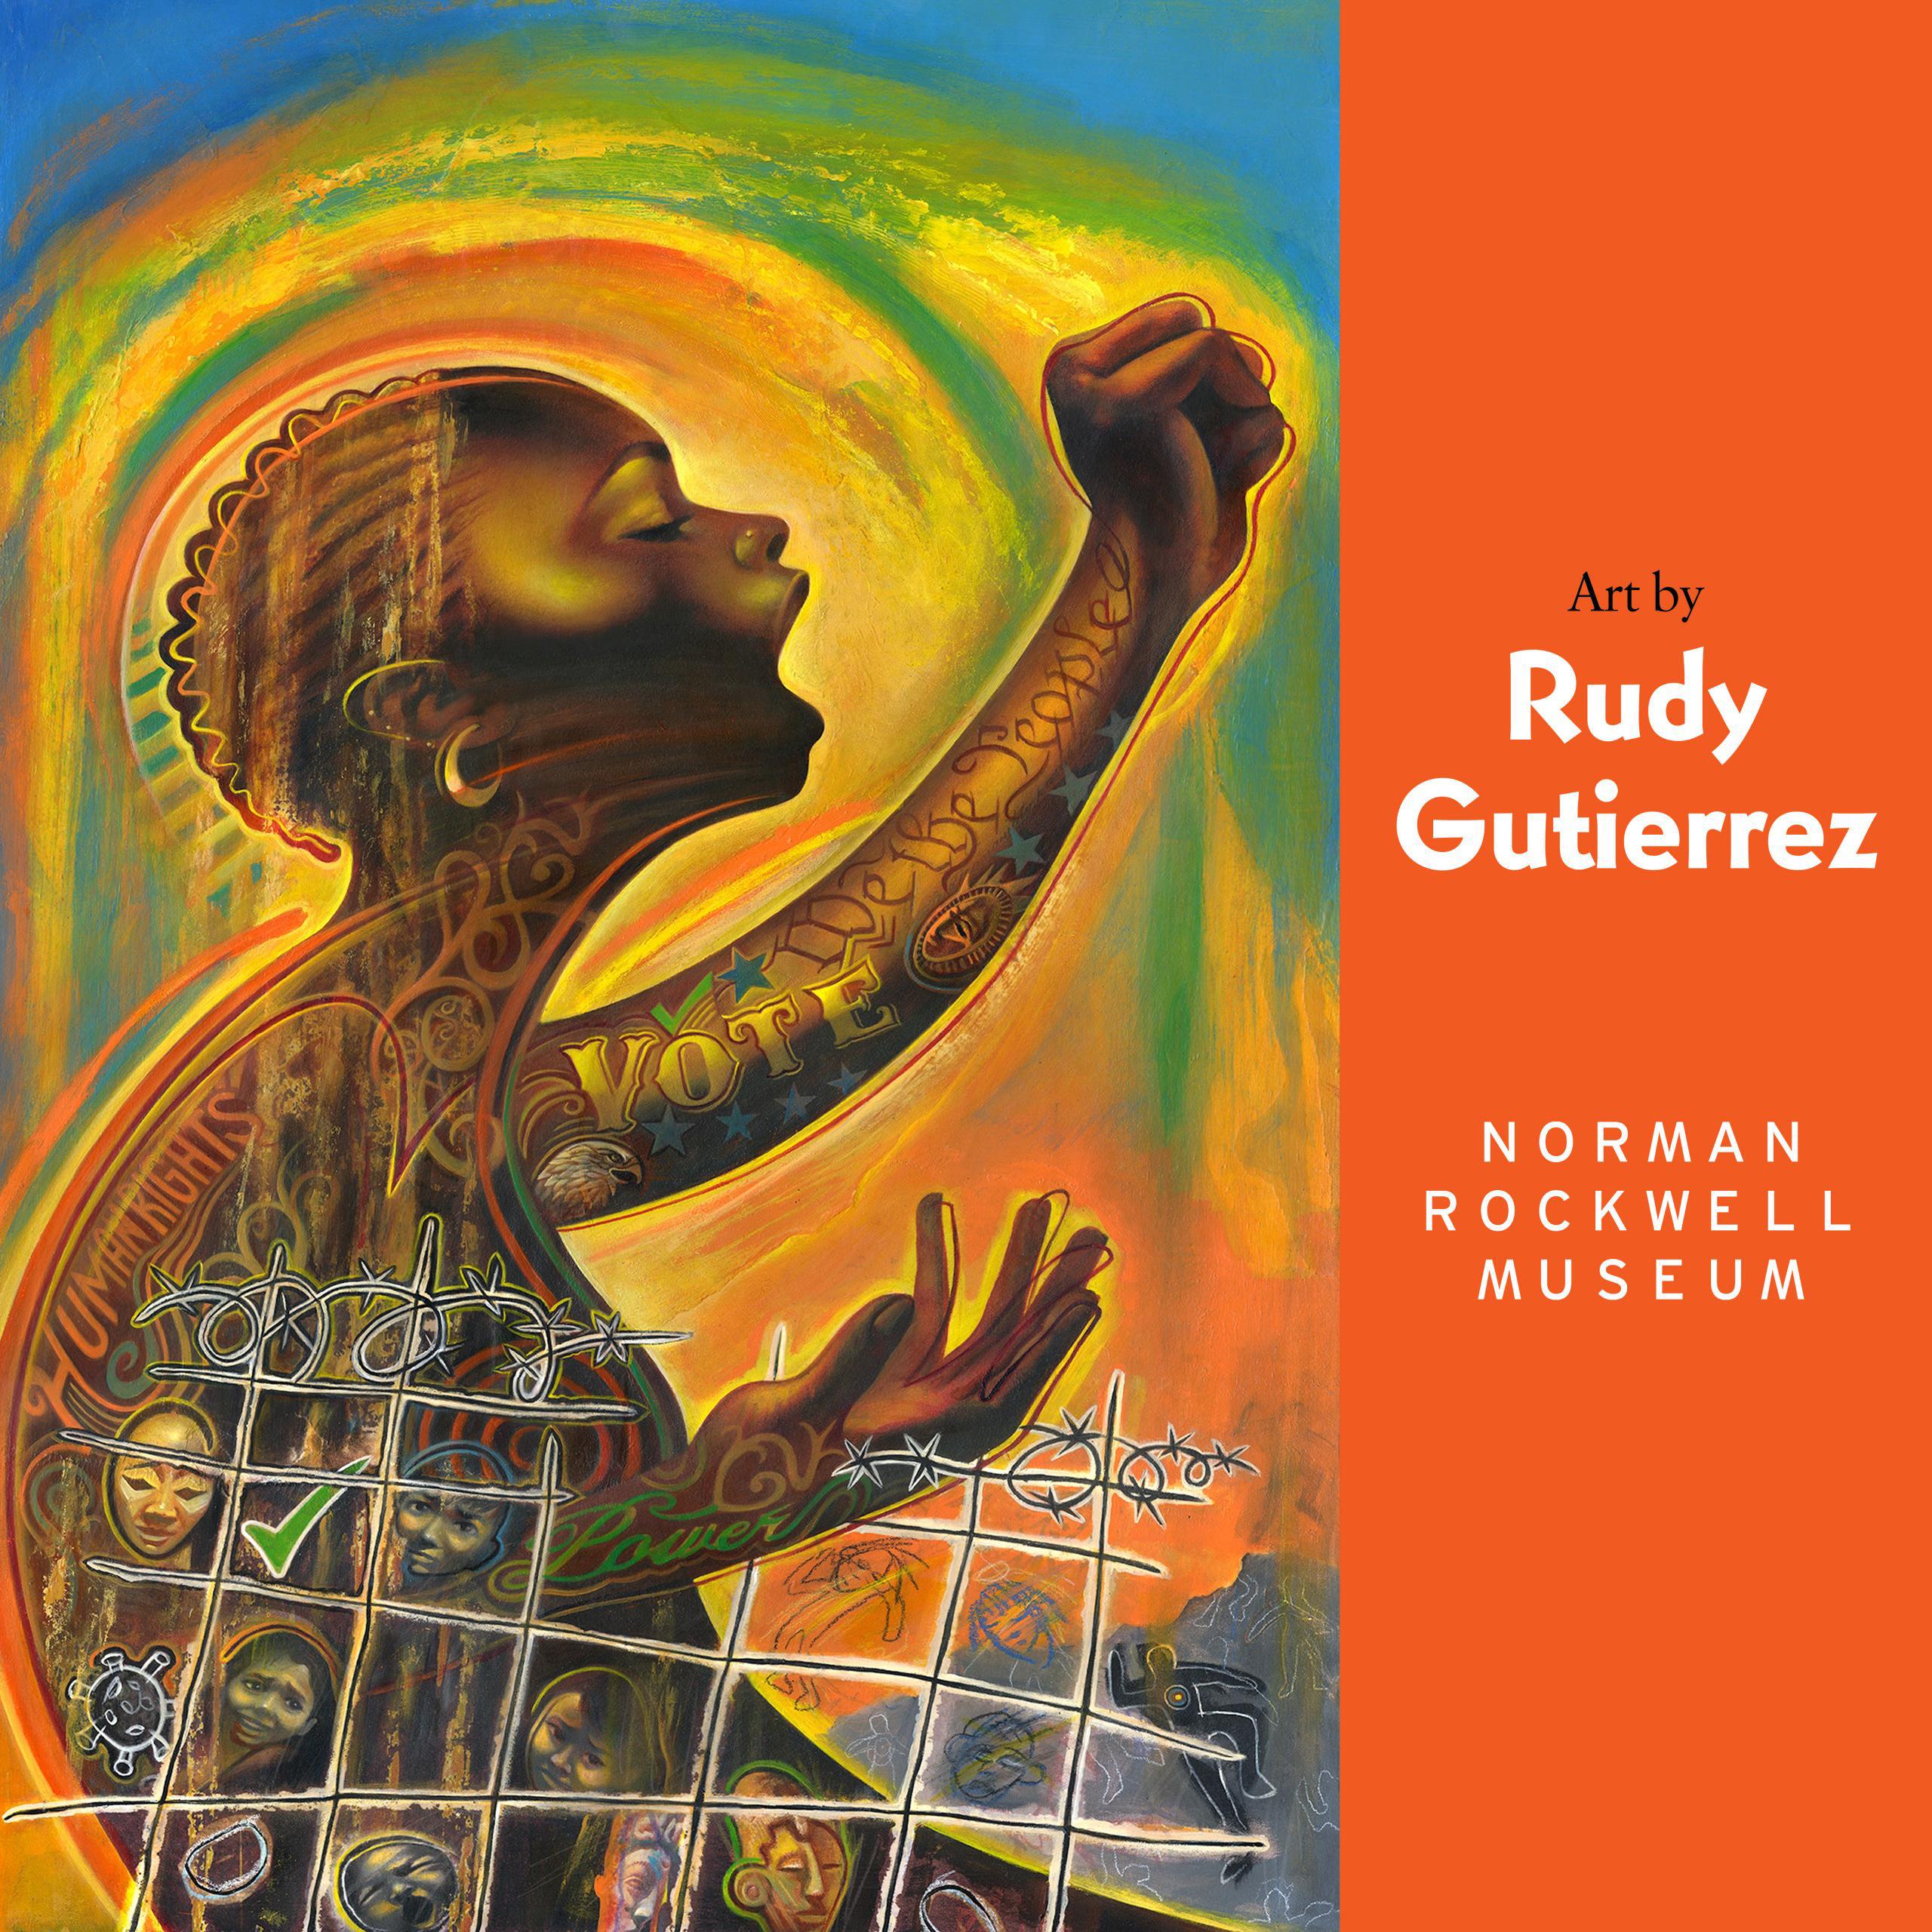 Rudy Gutierrez: Humanity, Not Politics